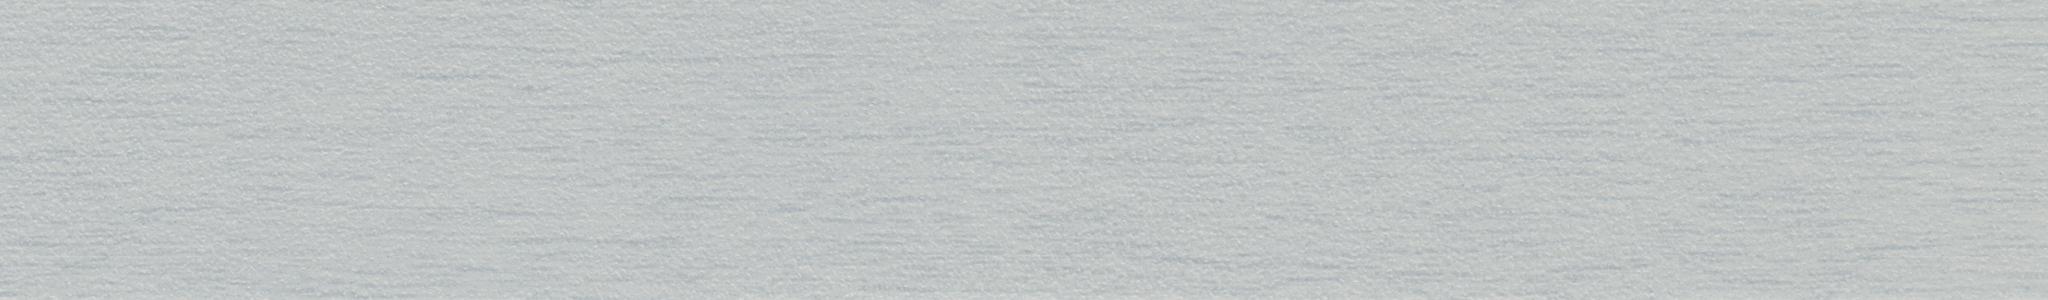 HD 298110 ABS Kante Dekor Aluminium perl